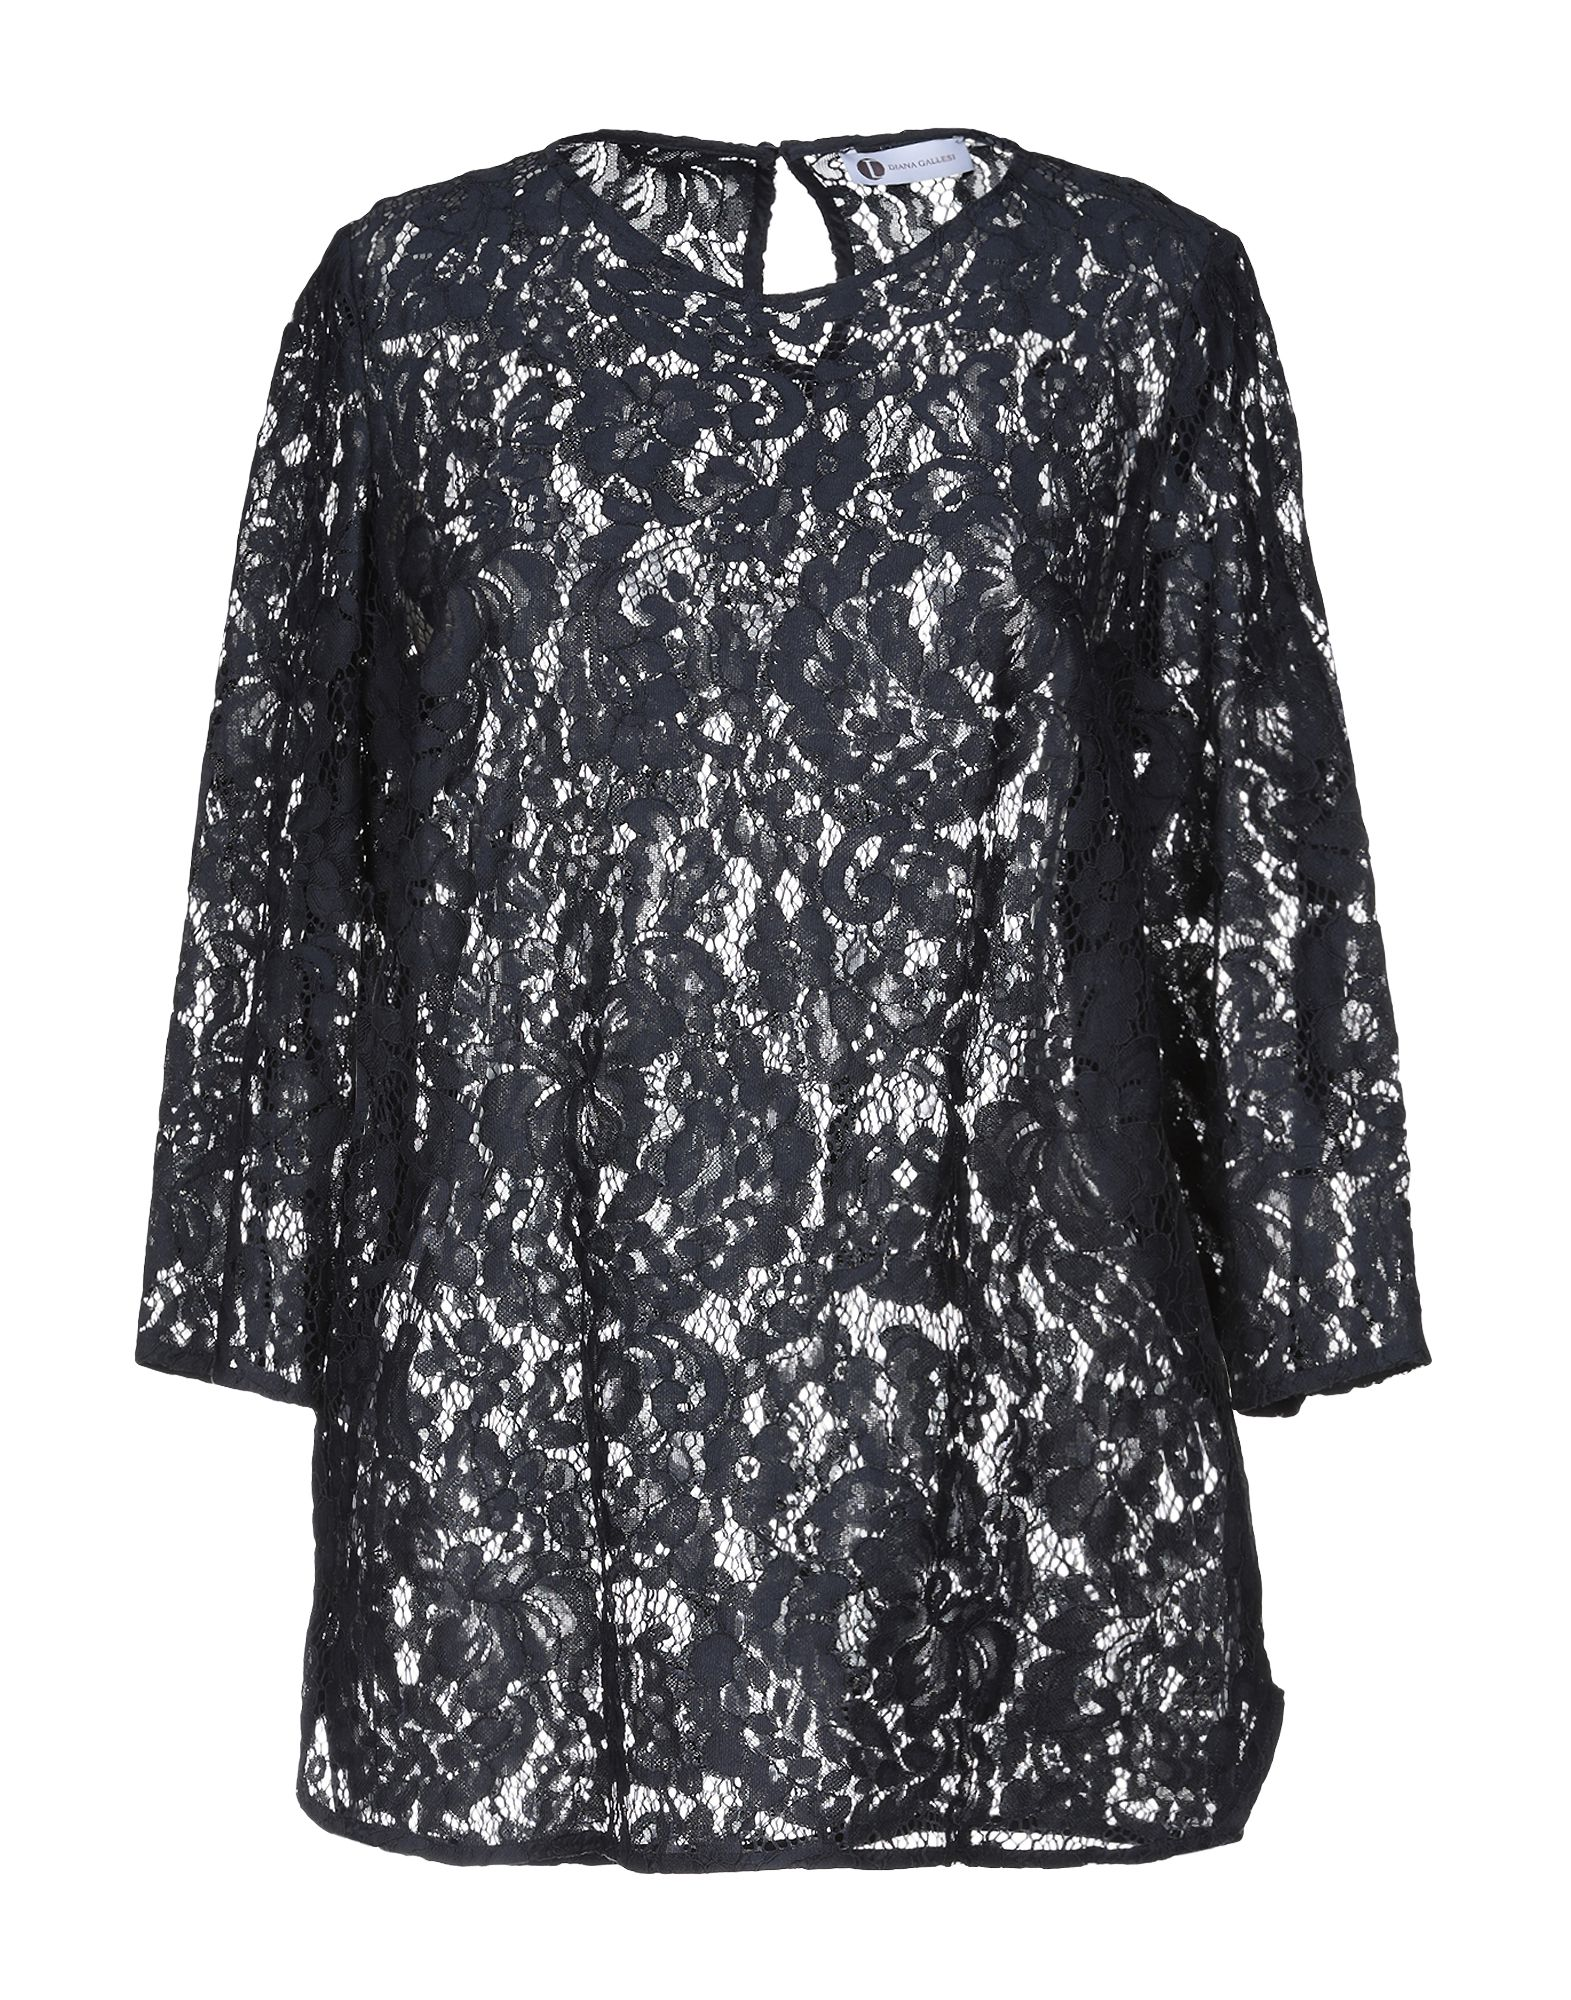 DIANA GALLESI Блузка блузка diana gallesi